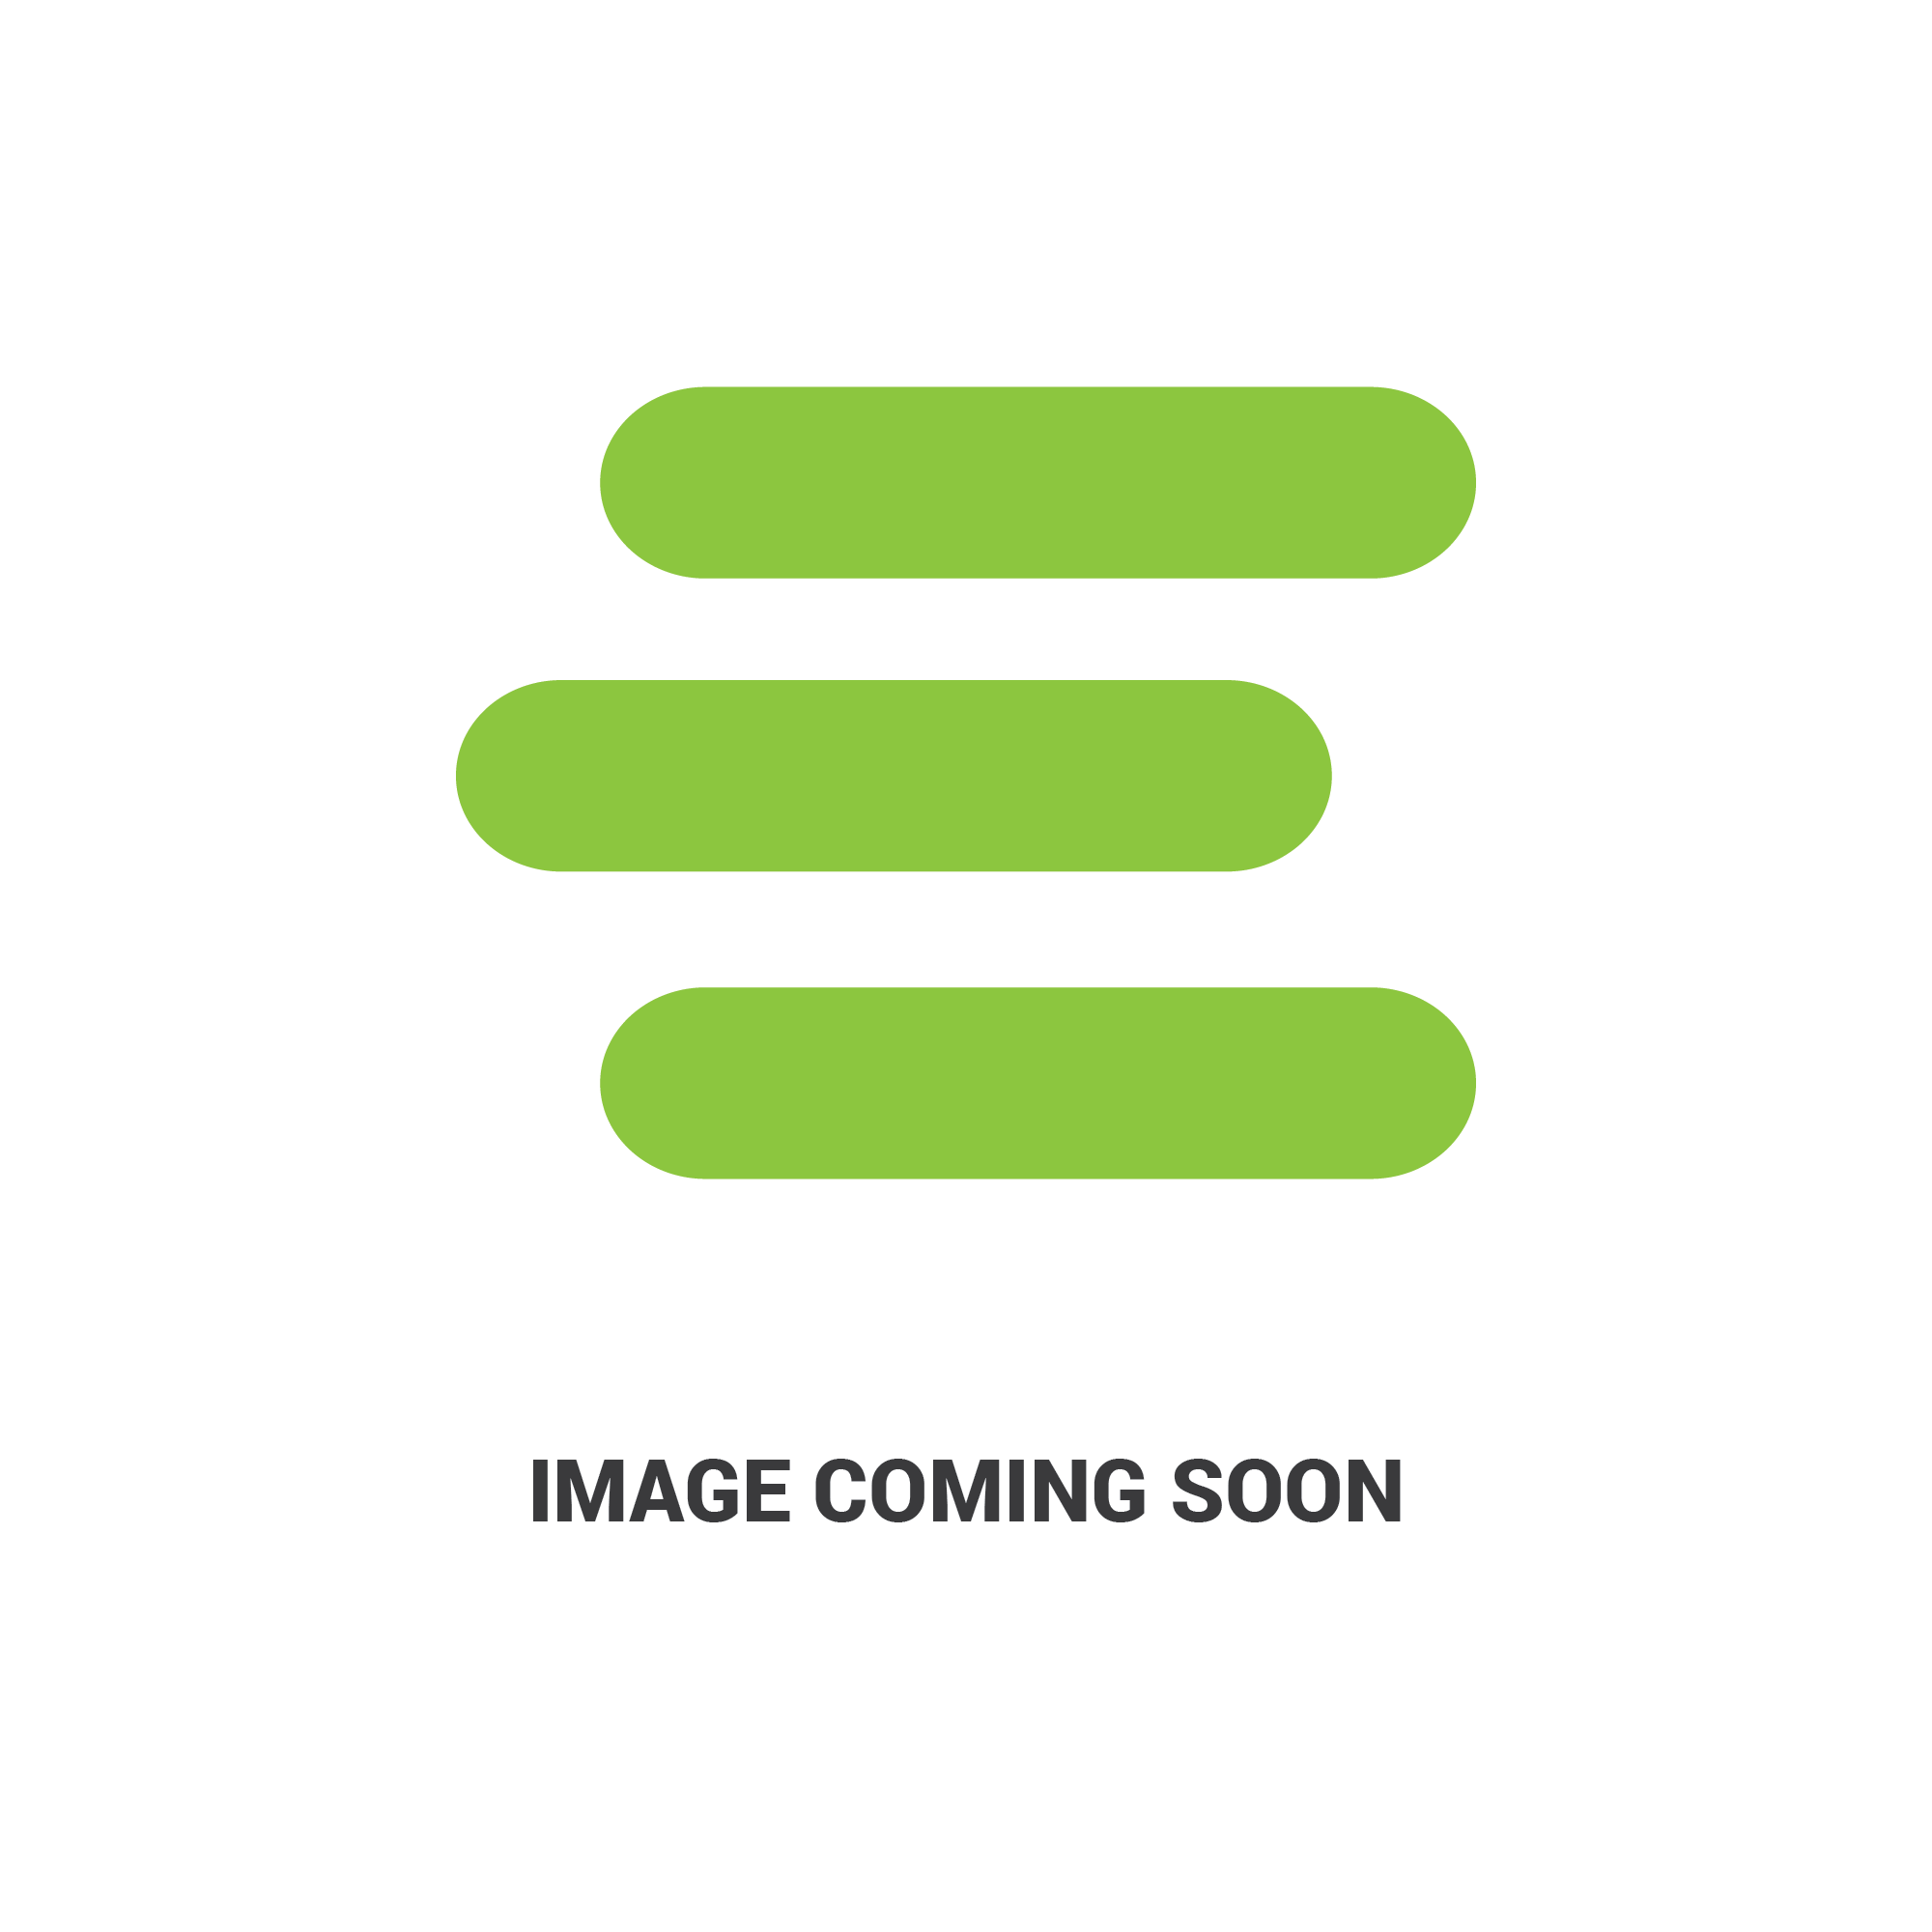 E-K1122-62260edit 1.jpg